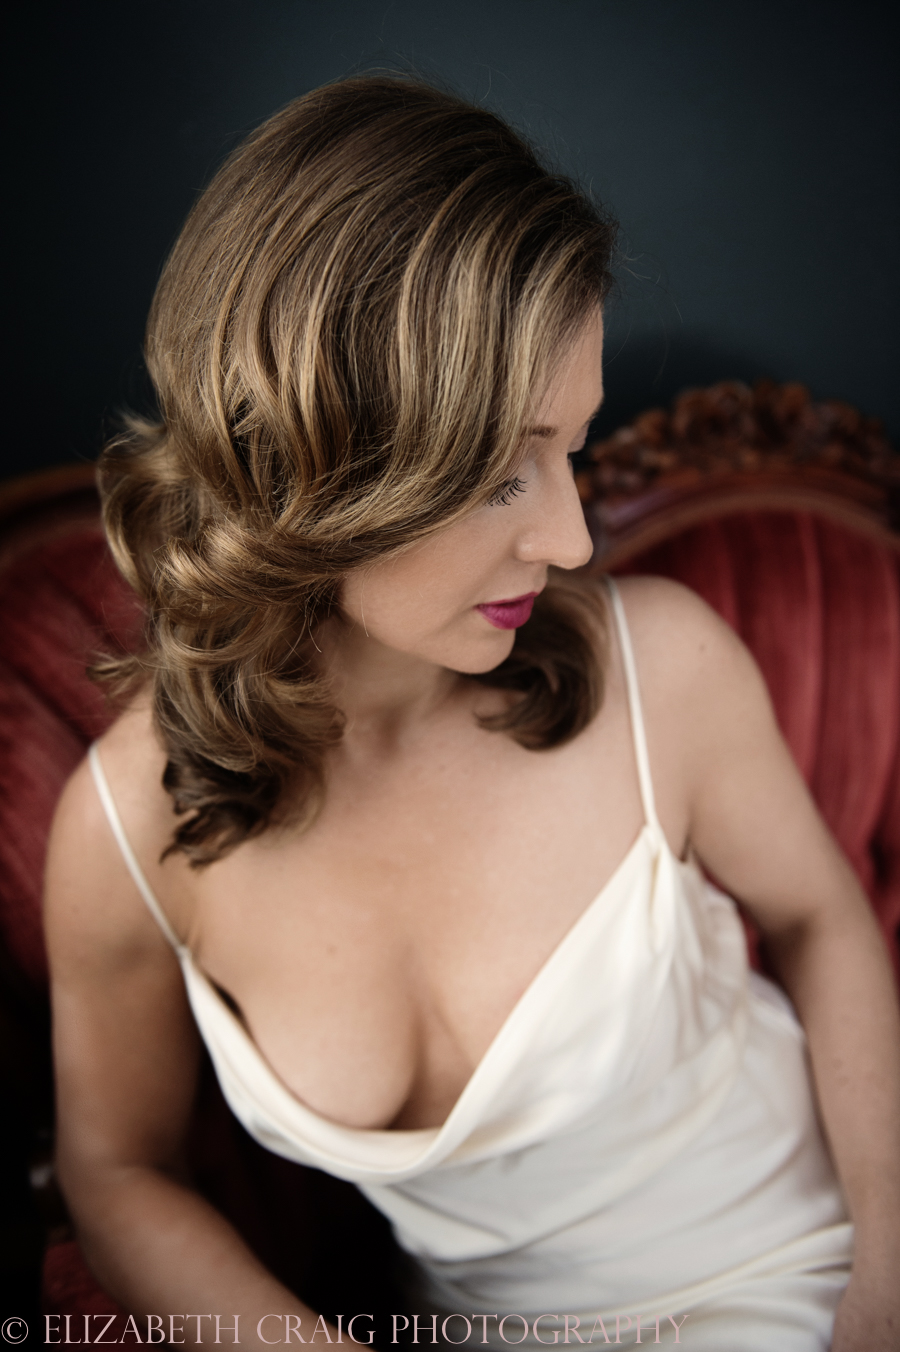 pittsburgh-woman-portrait-photographer-elizabeth-craig-photography-001